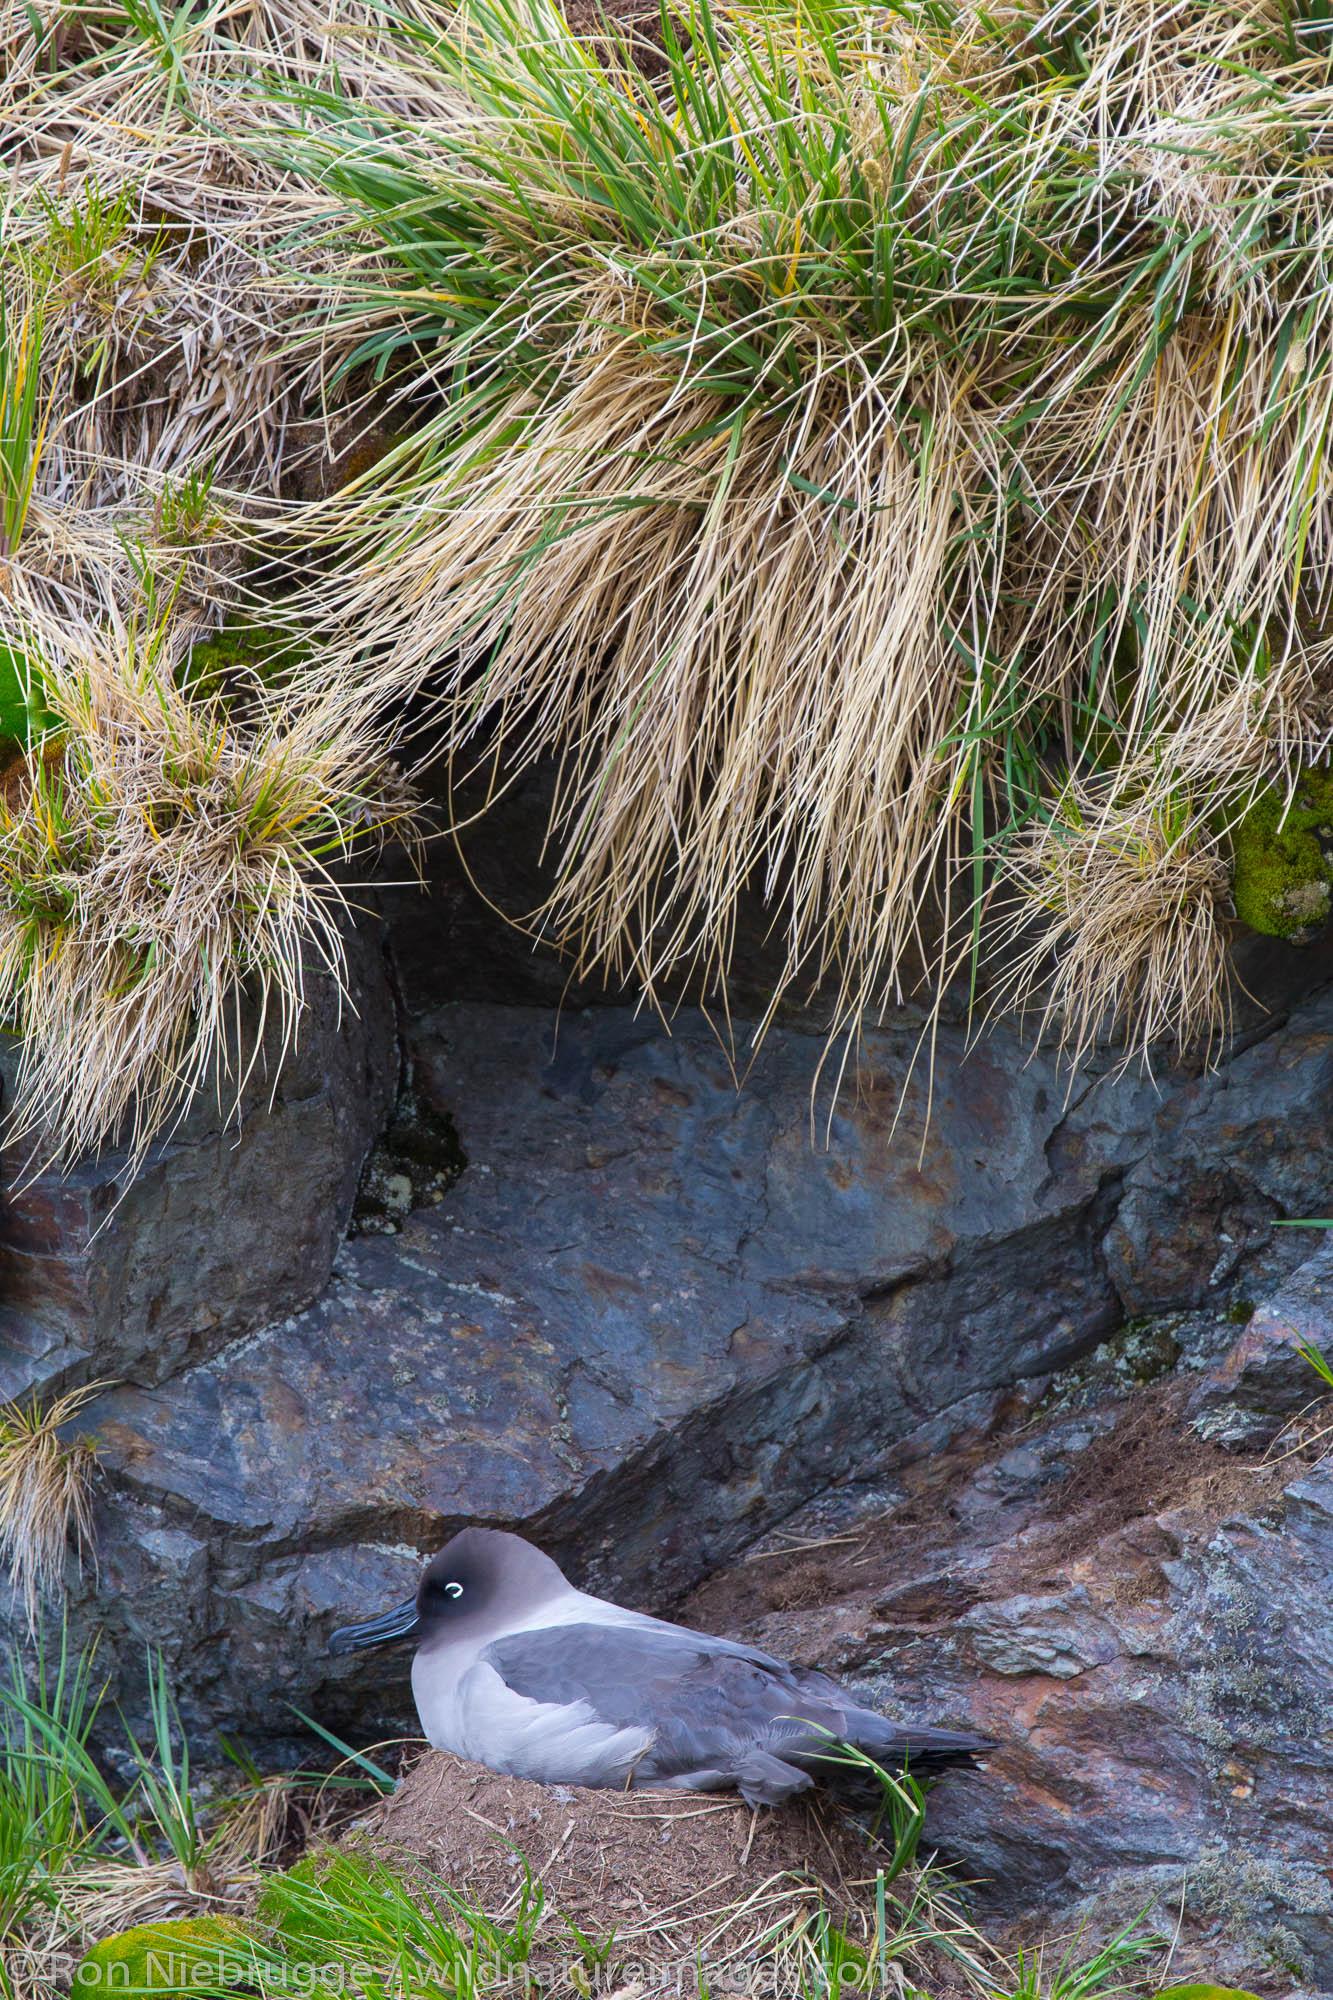 Antarctica, bird, photos, photo